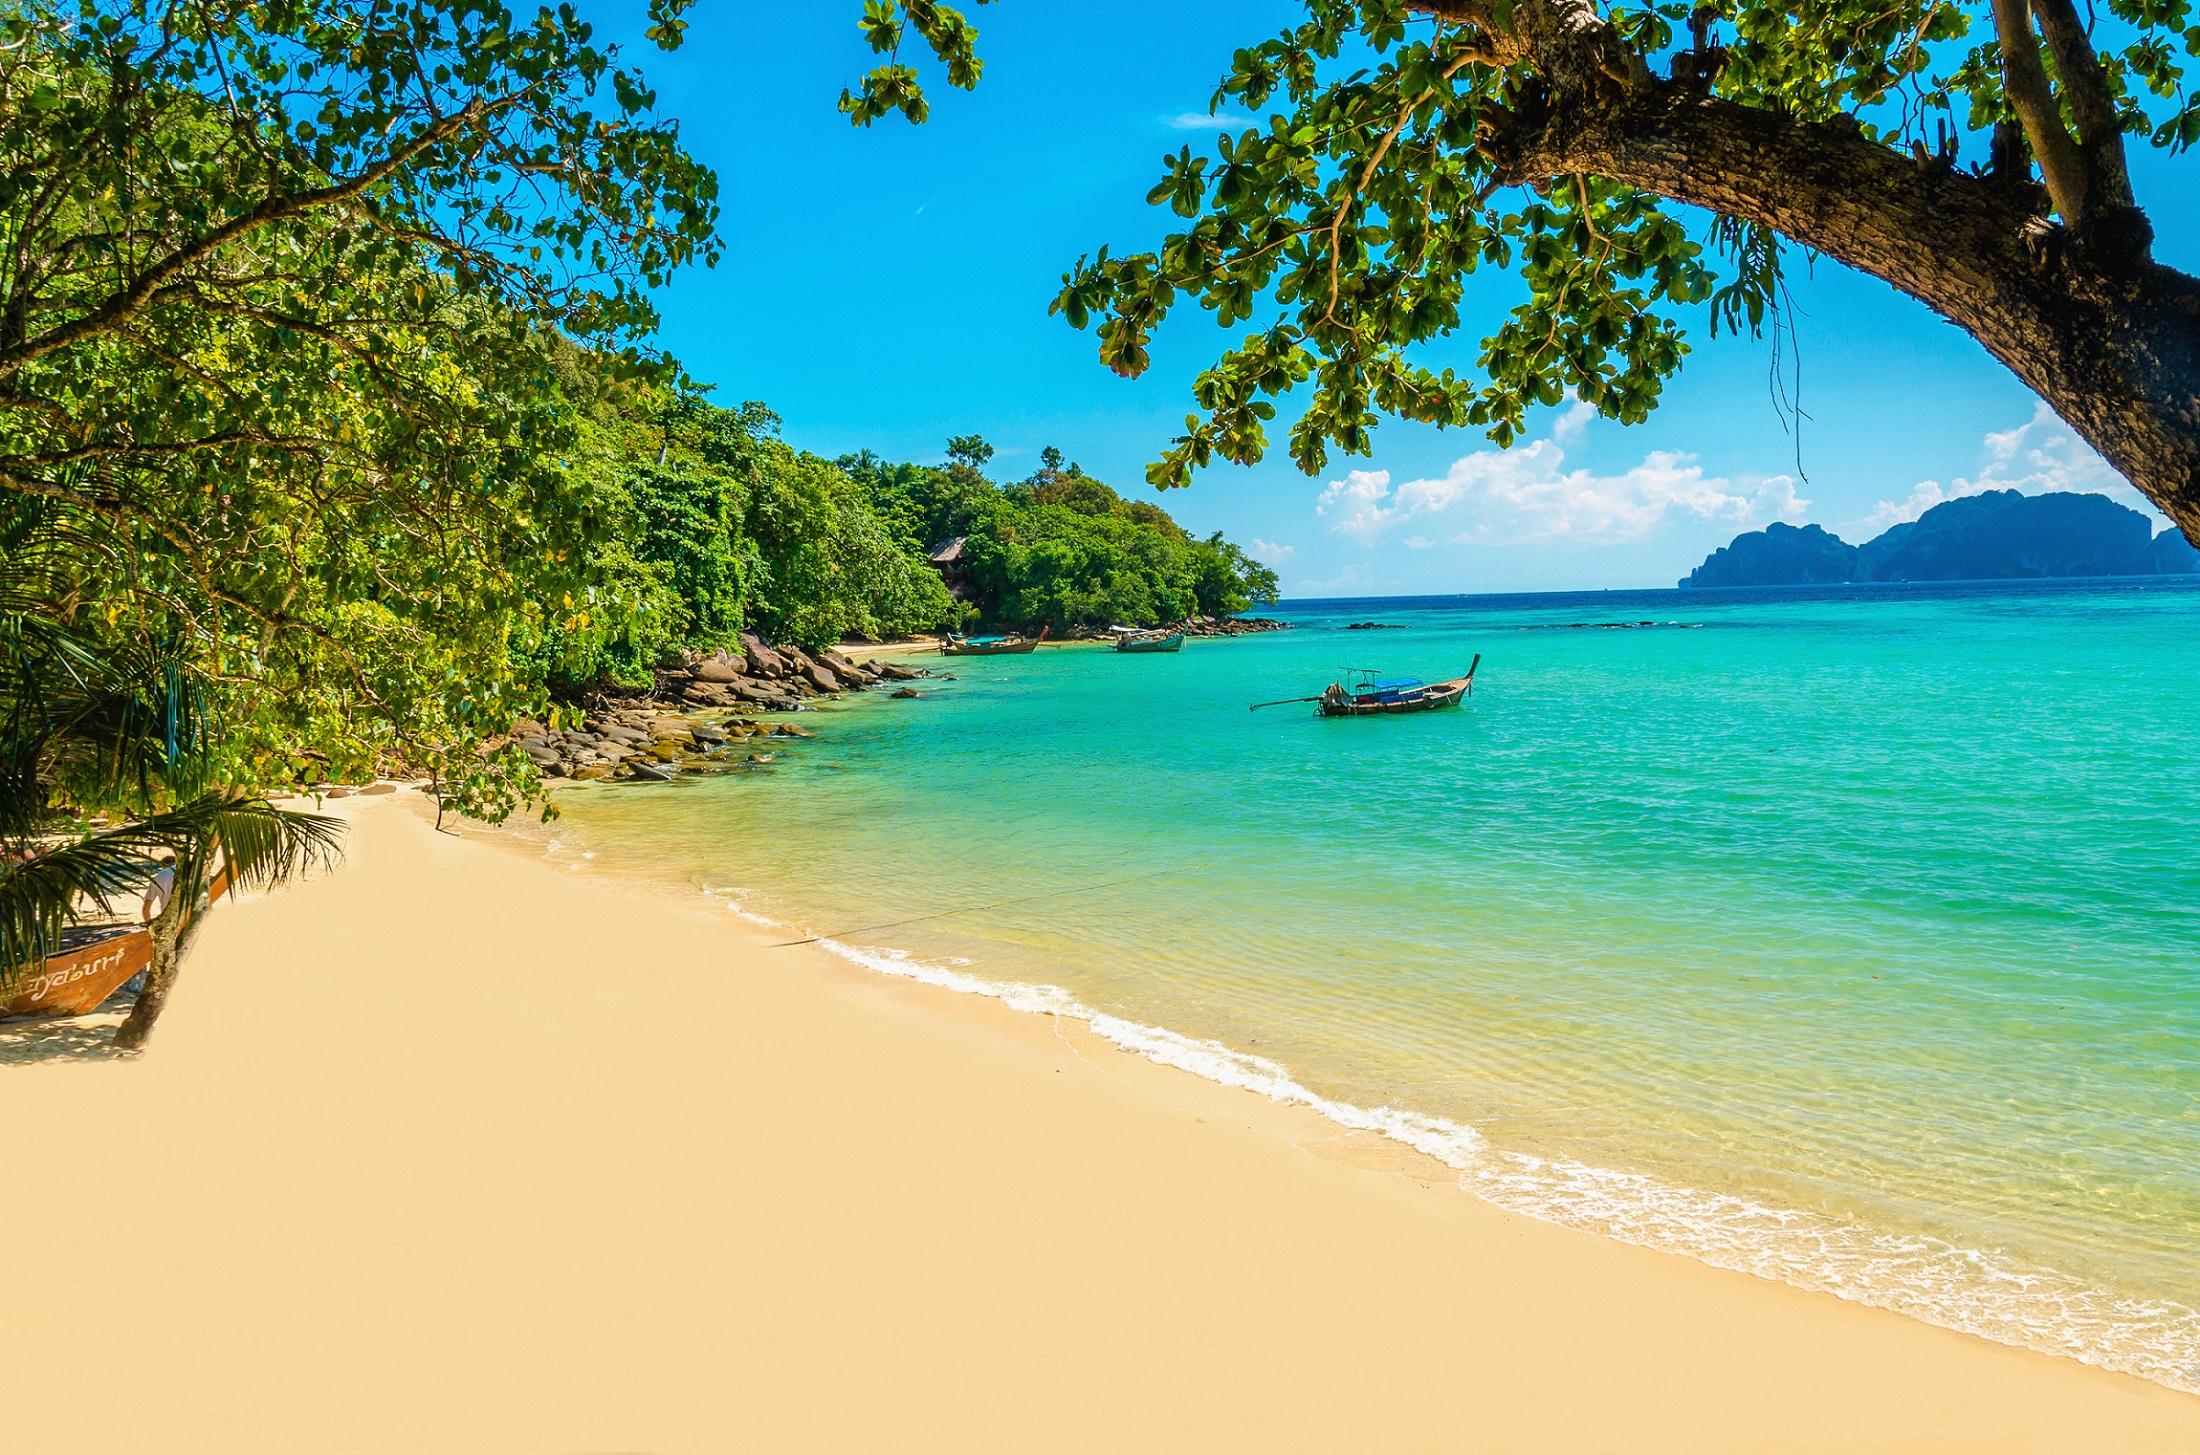 Mejor época para viajar a lombok